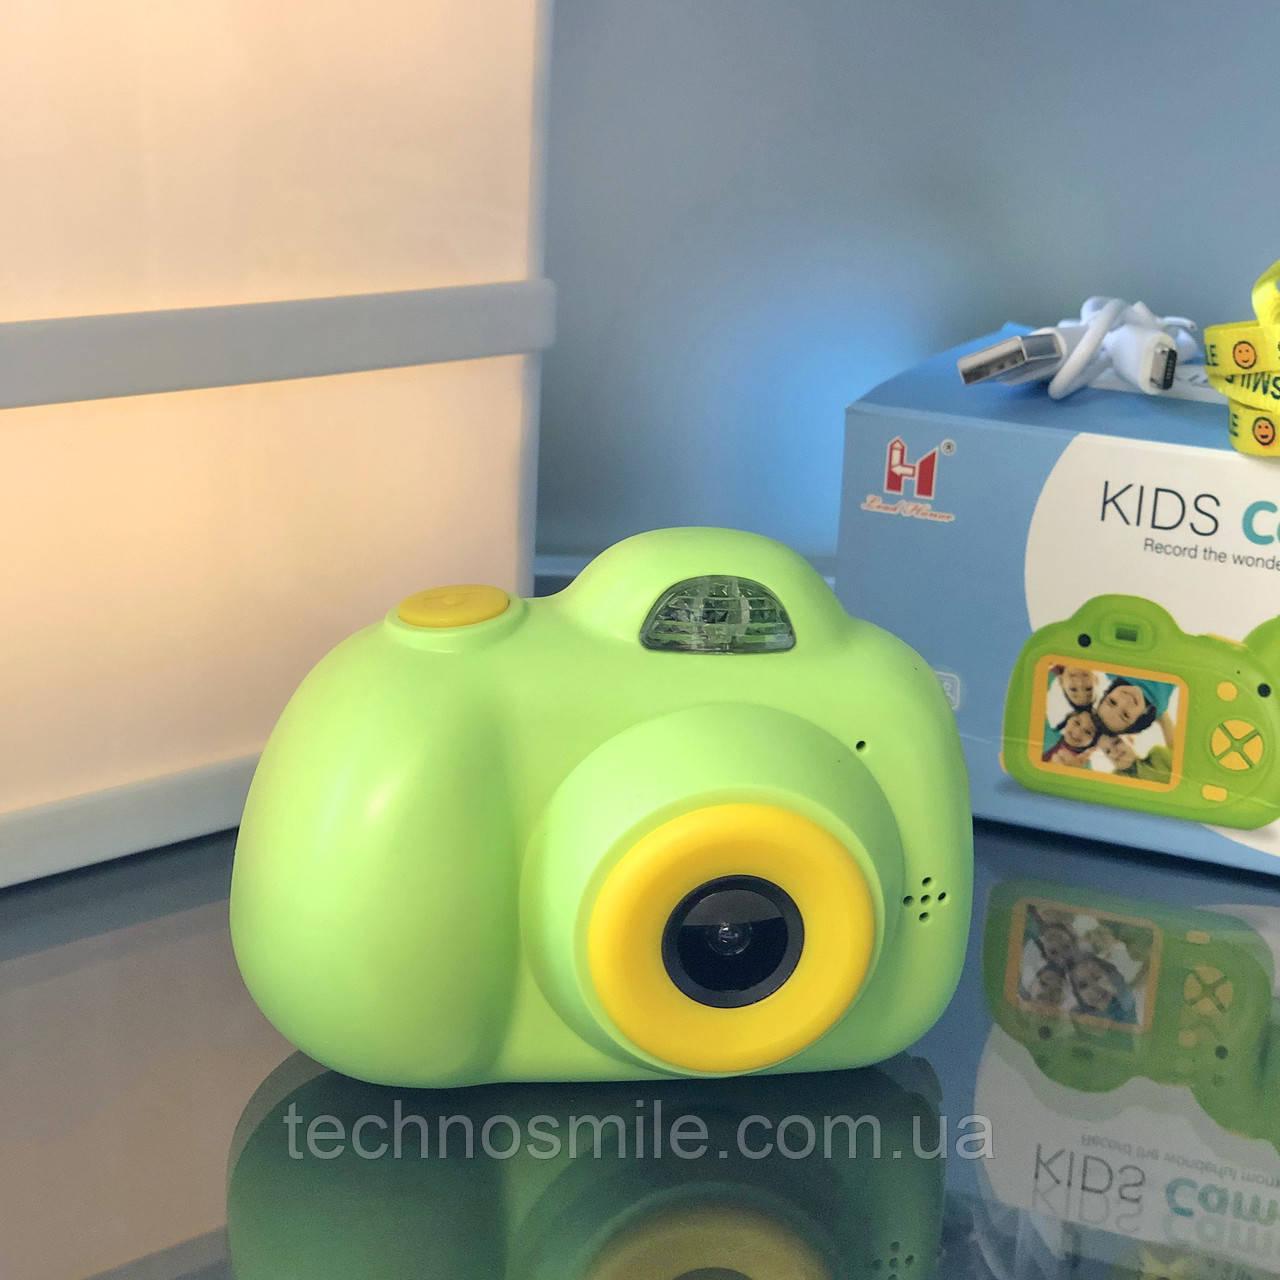 Дитячий фотоапарат, Kids Camera c дисплеєм, дитяча фотокамера, Зелена